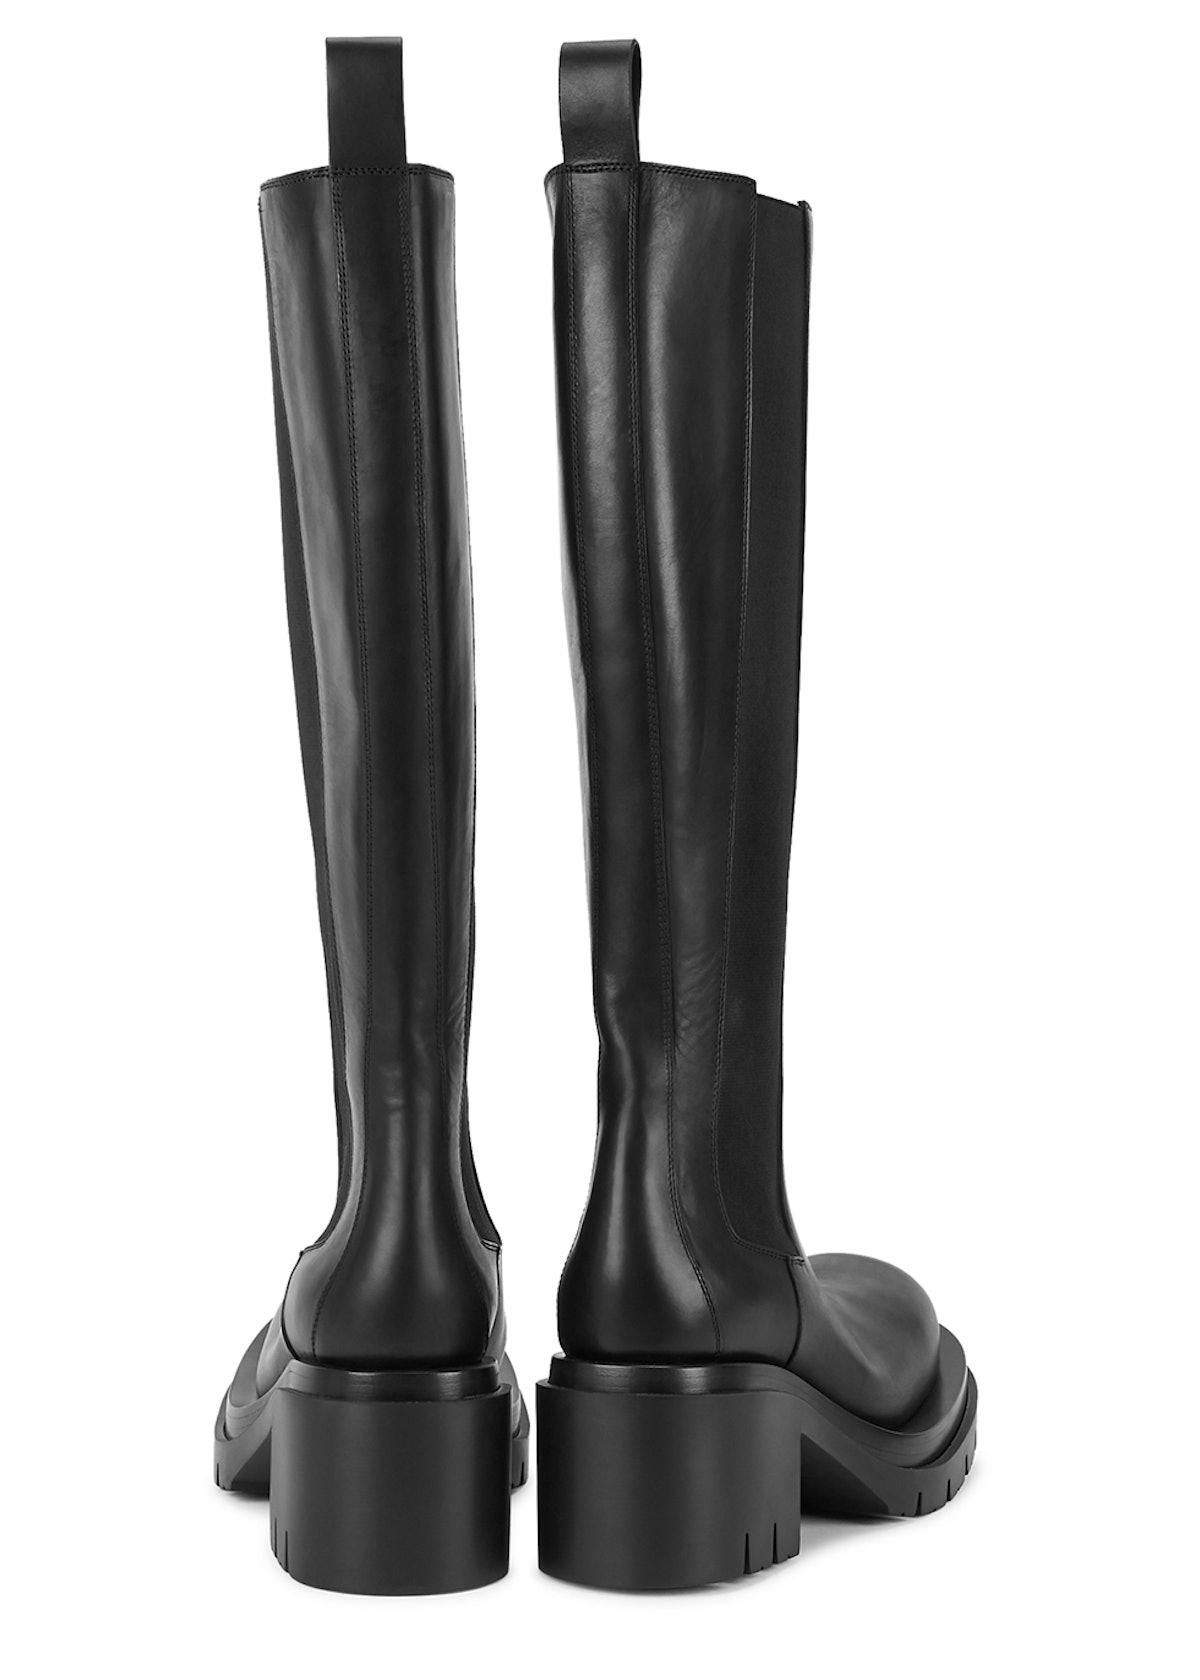 Lug black leather knee-high Chelsea boots: additional image